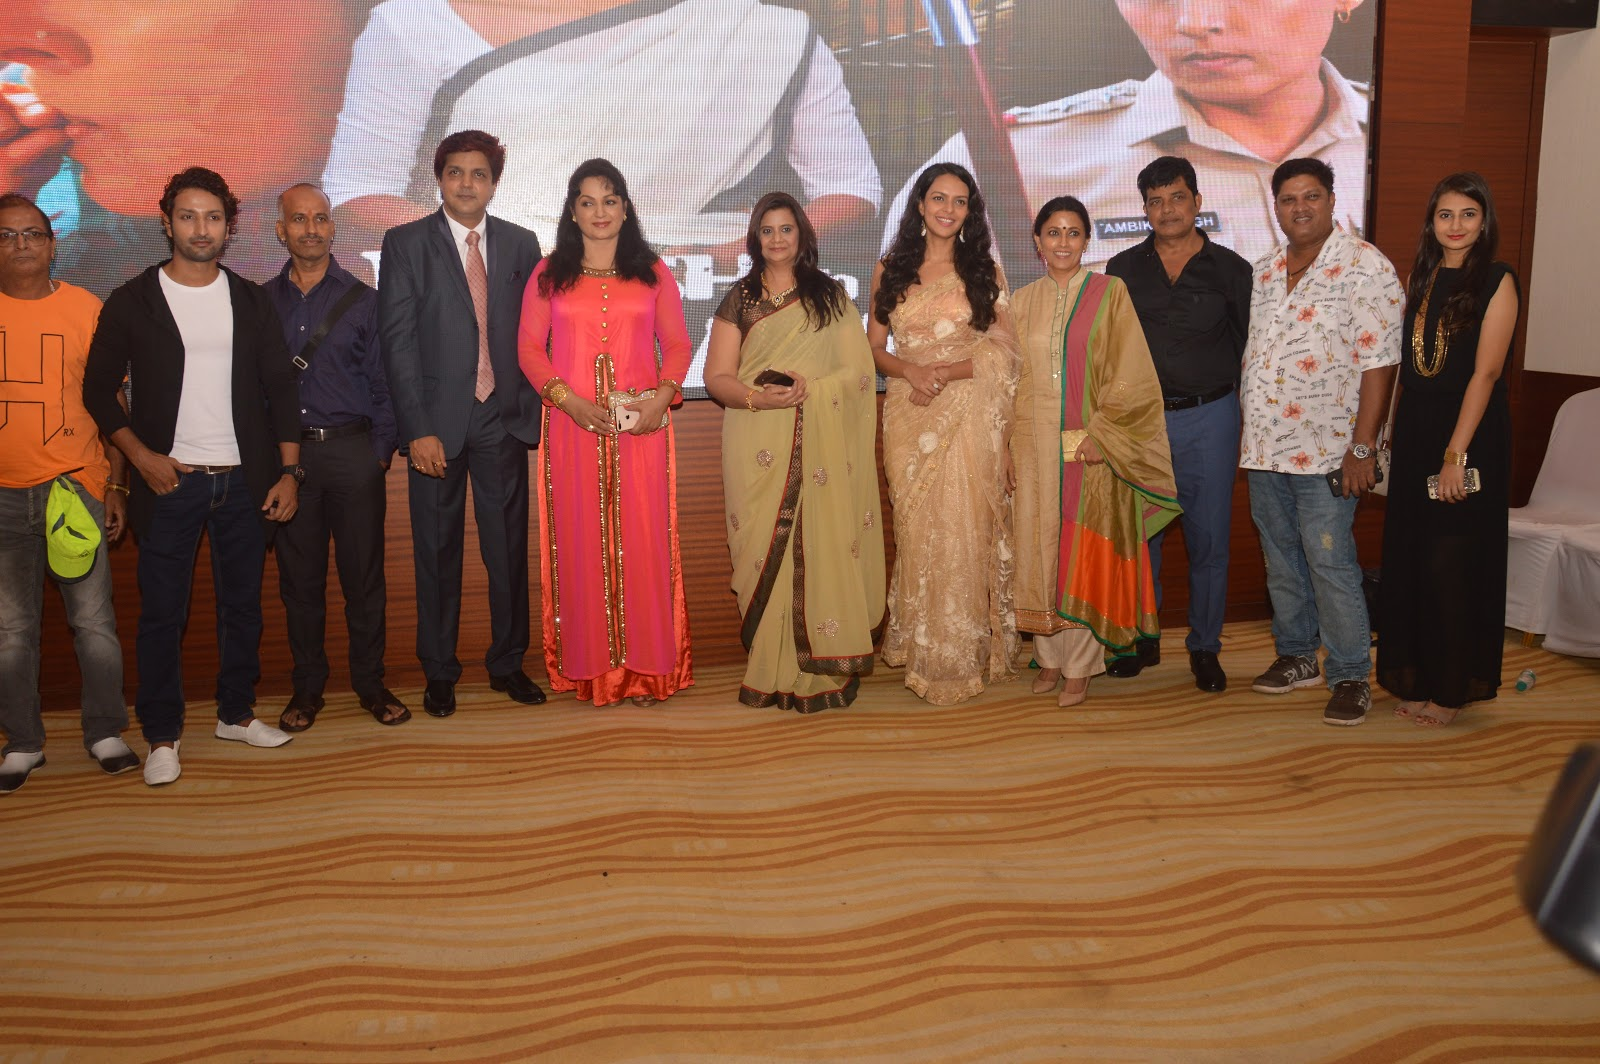 Bidita Bag Meghna Malik Launched Their Upcoming Movie Moksh To Maya S Teaser